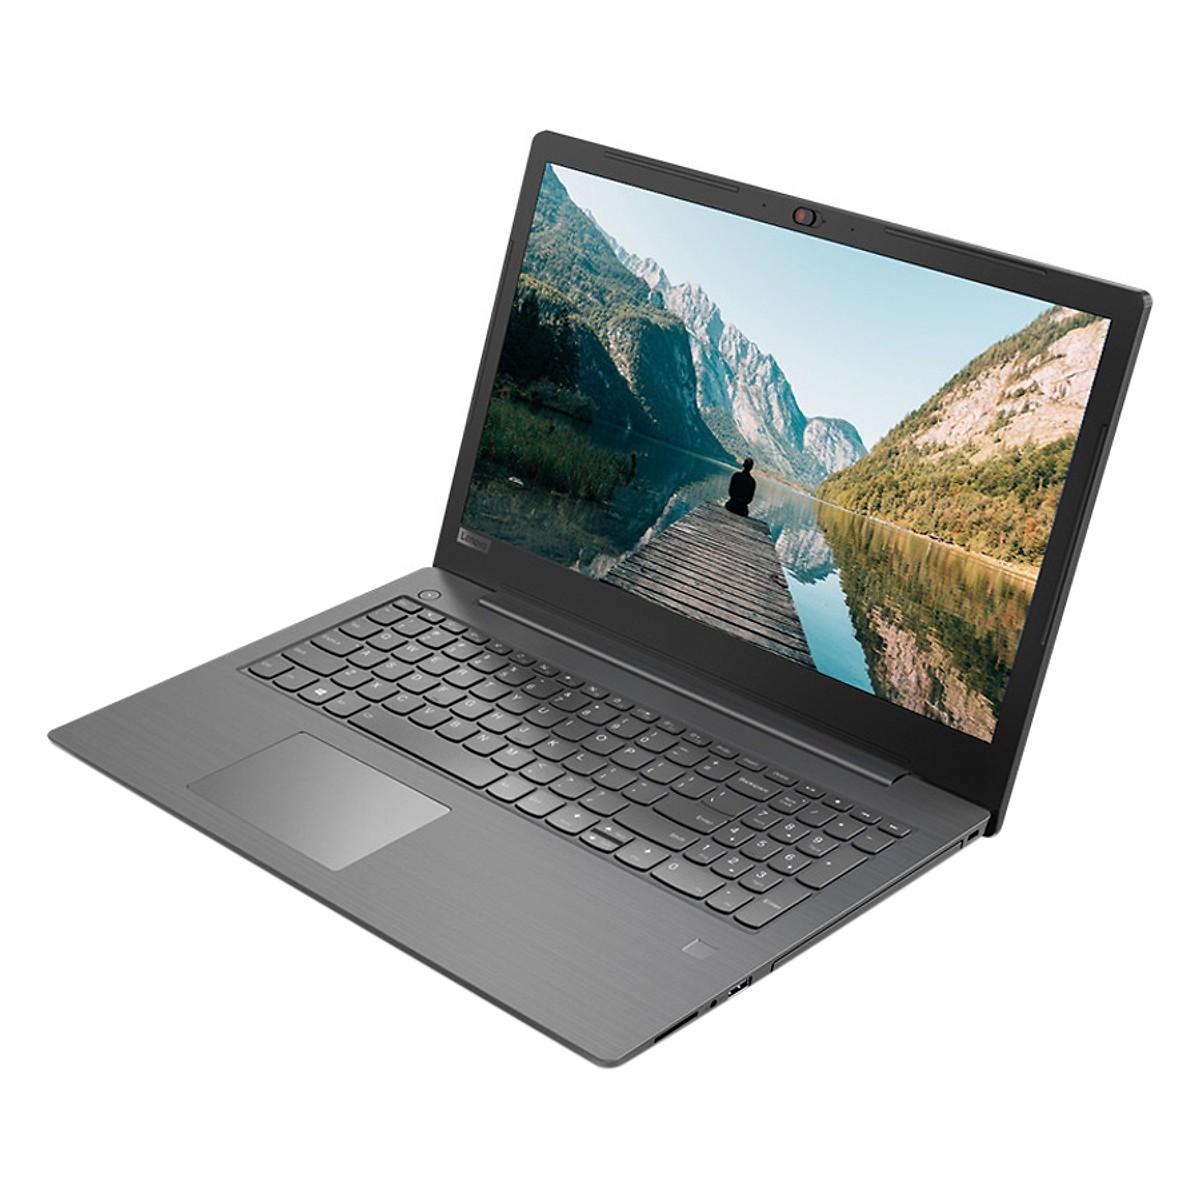 Laptop Lenovo V330 15IKB-81AX00MCVN (Grey)